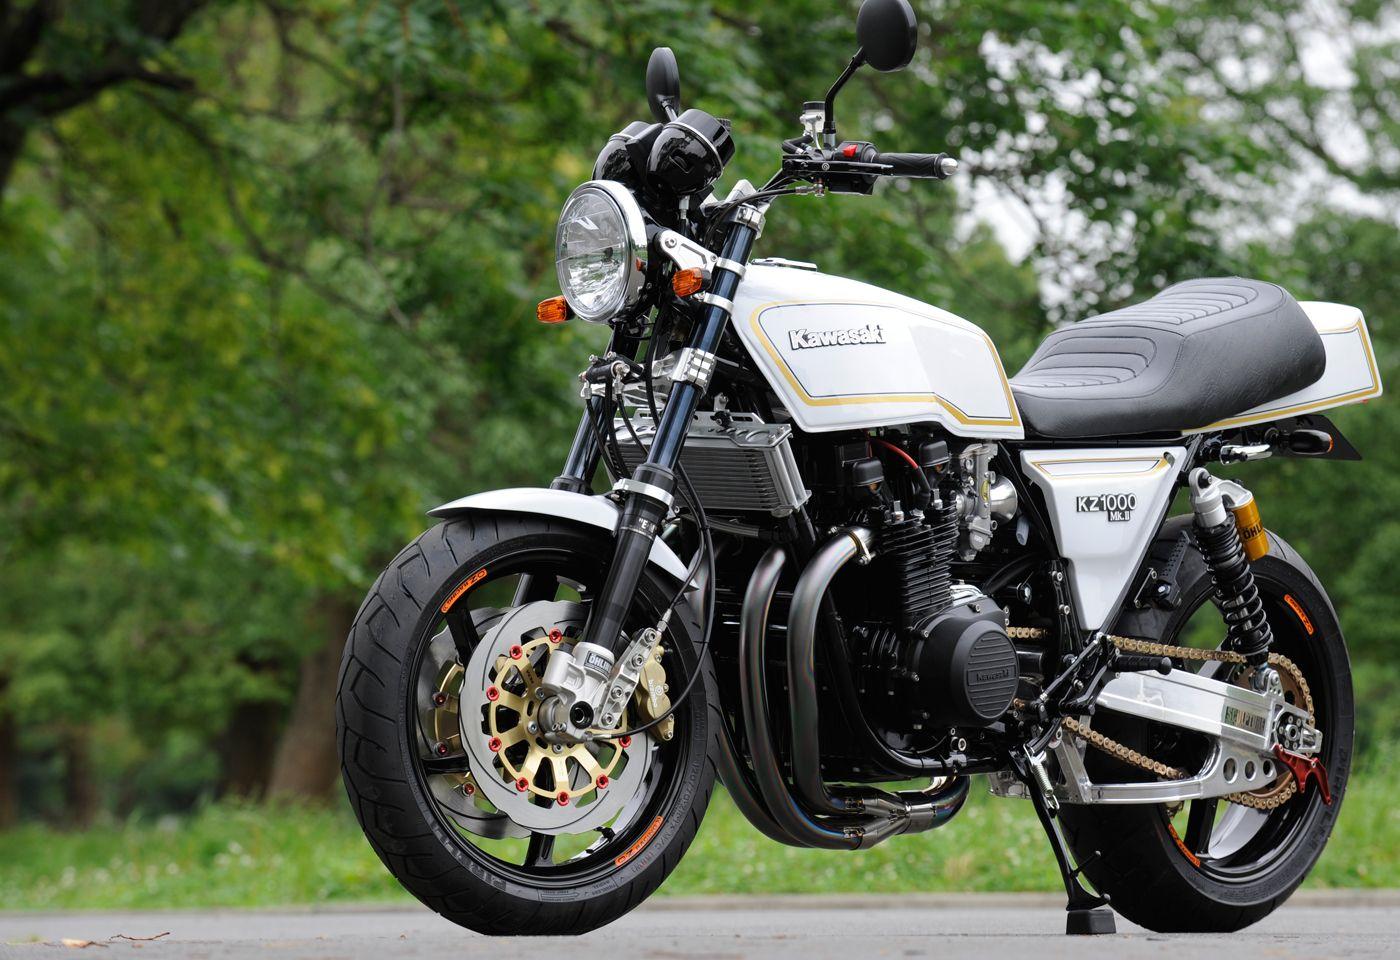 RCM-265 / KZ1000MK-Ⅱ | ネイキッド バイク, 旧車バイク, カワサキのバイク